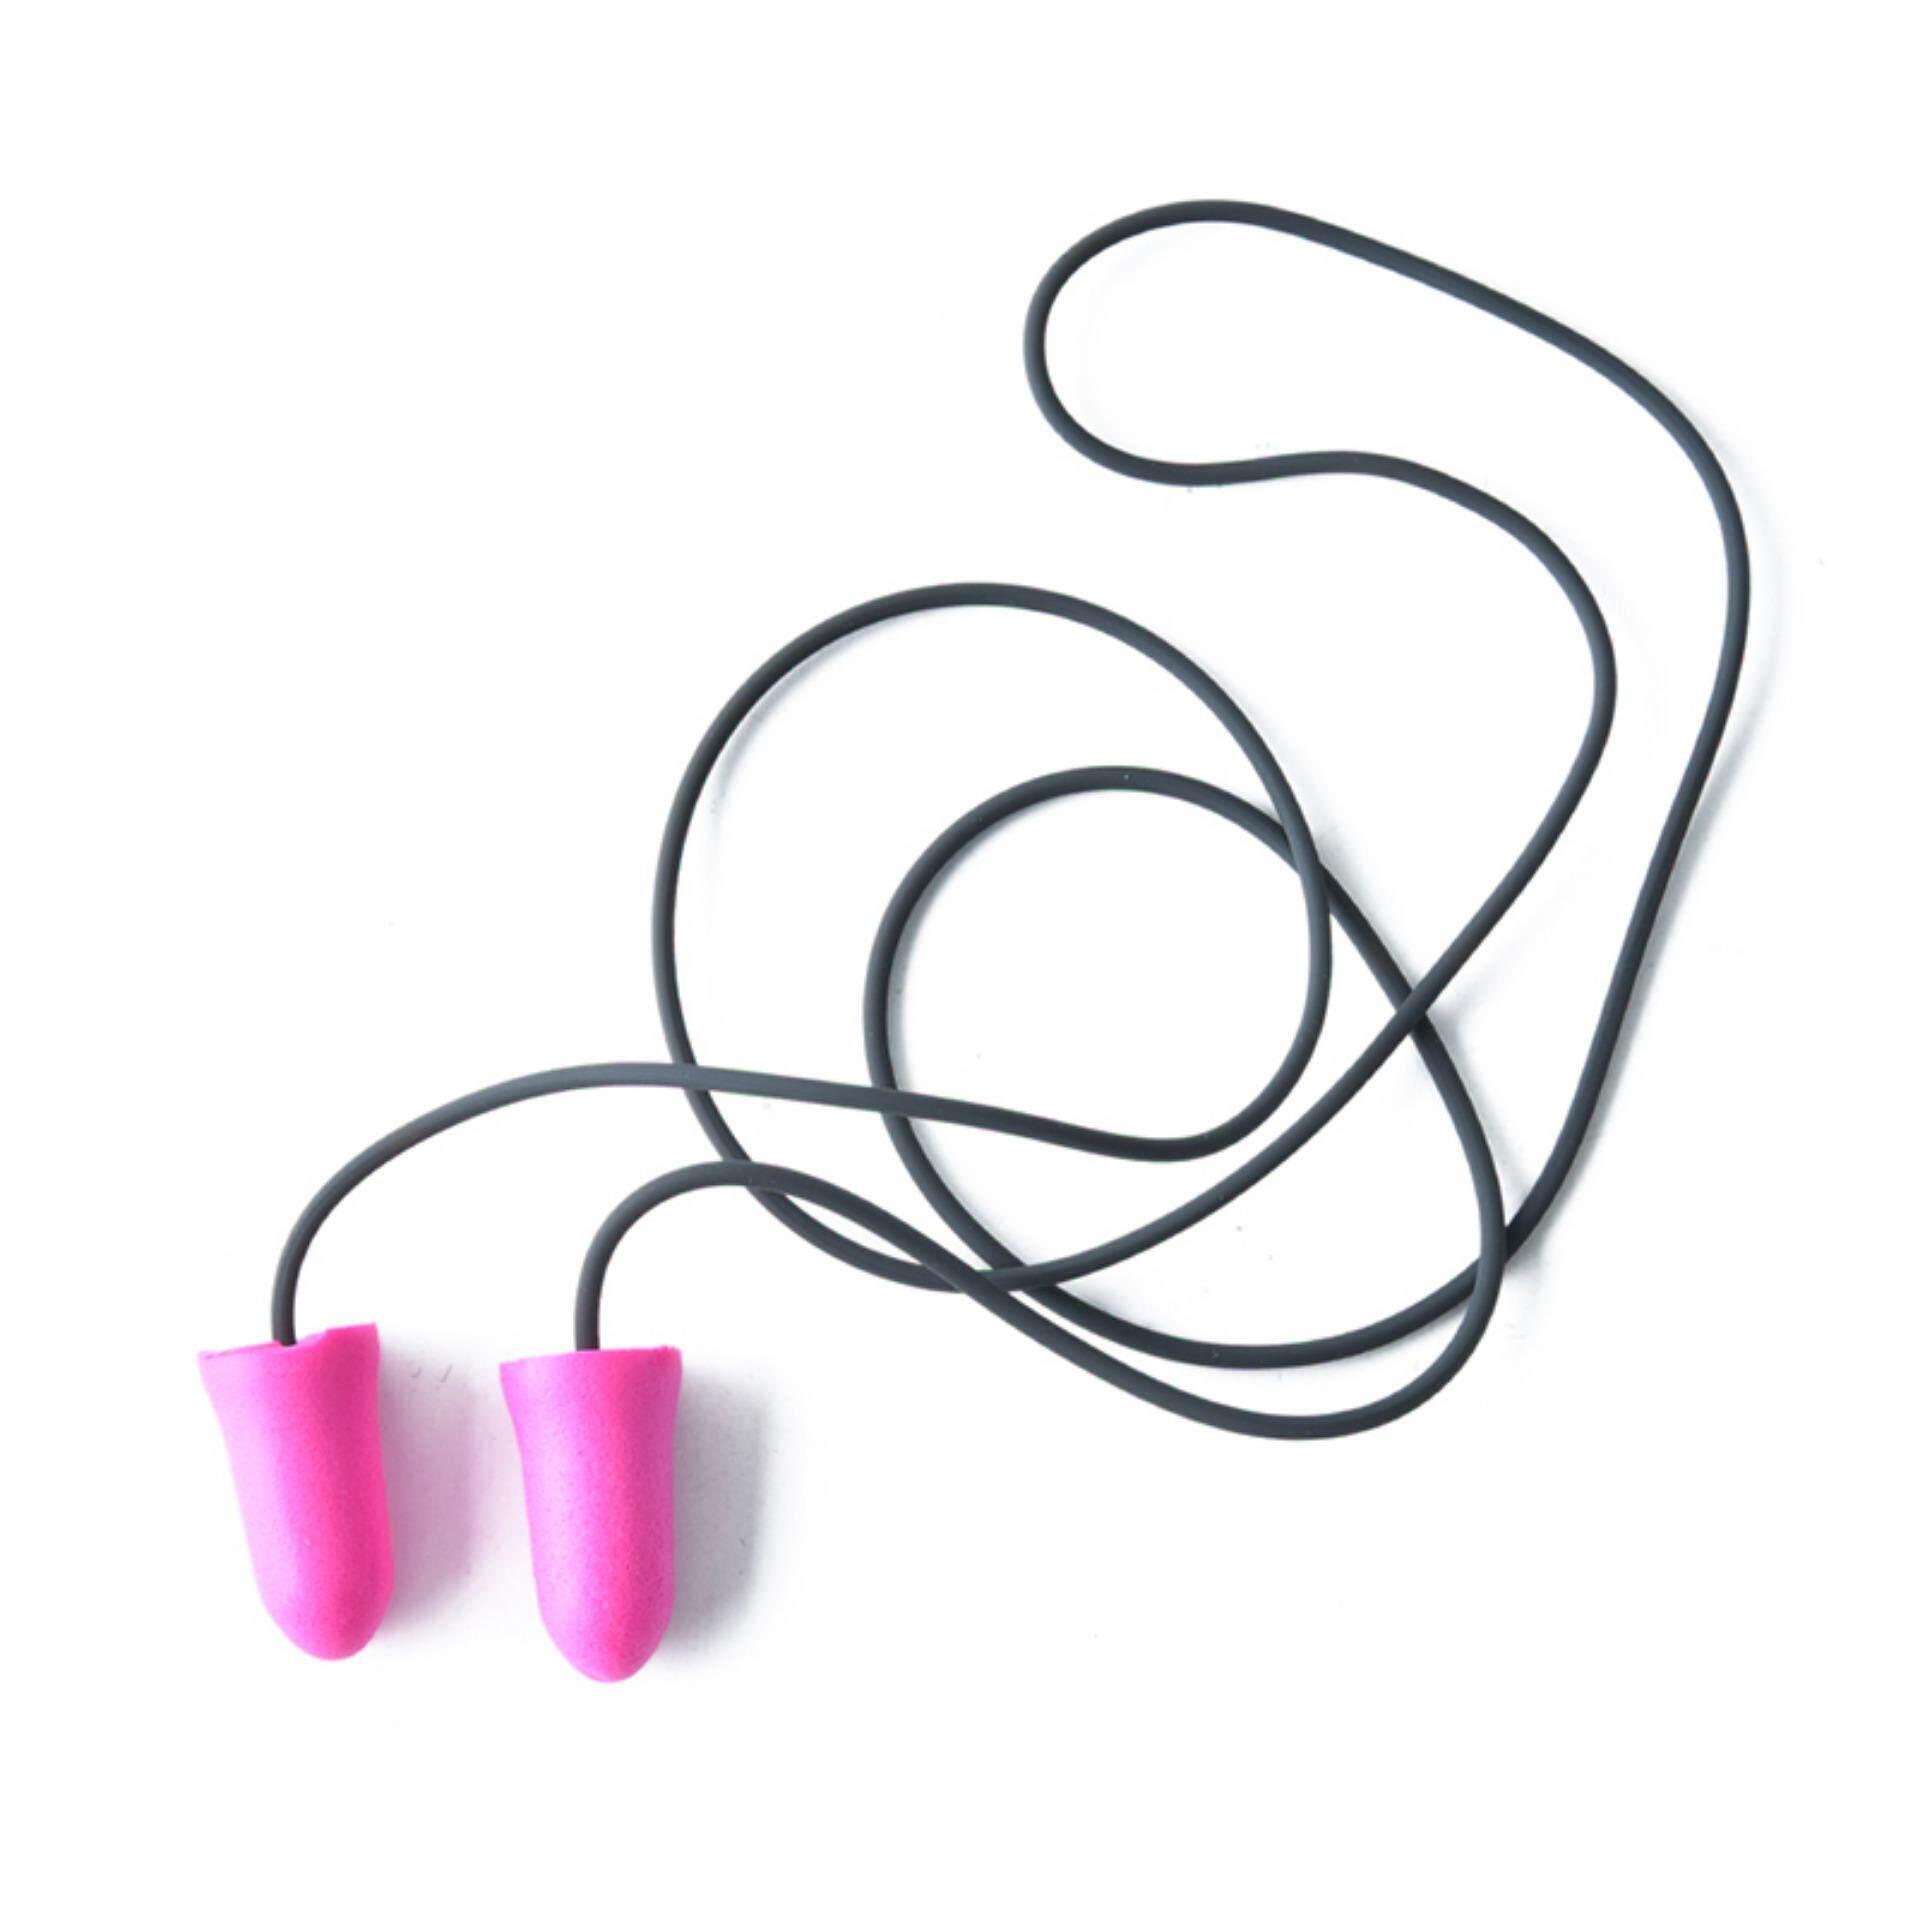 3m Ultrafit Corded Earplugs Pelindung Telinga Dari Kebisingan 3 Buah Earplug Np354 Penutup Kuping Kuning 3buah Source Soft Rose Foam Prevent